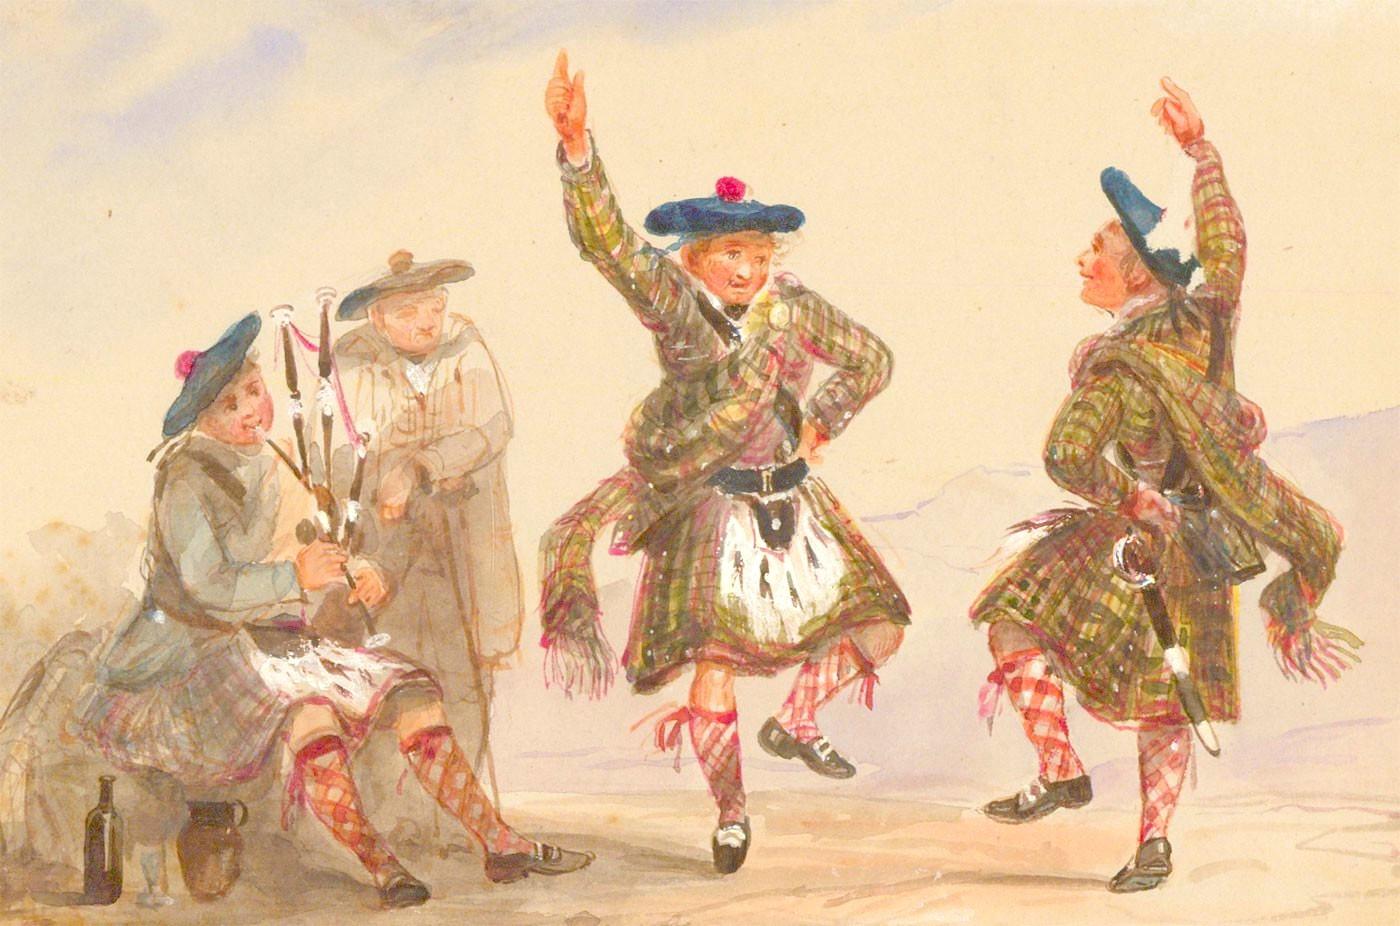 Scottish School Late 19th Century Watercolour - Scottish Dancers in a Landscape with Piper